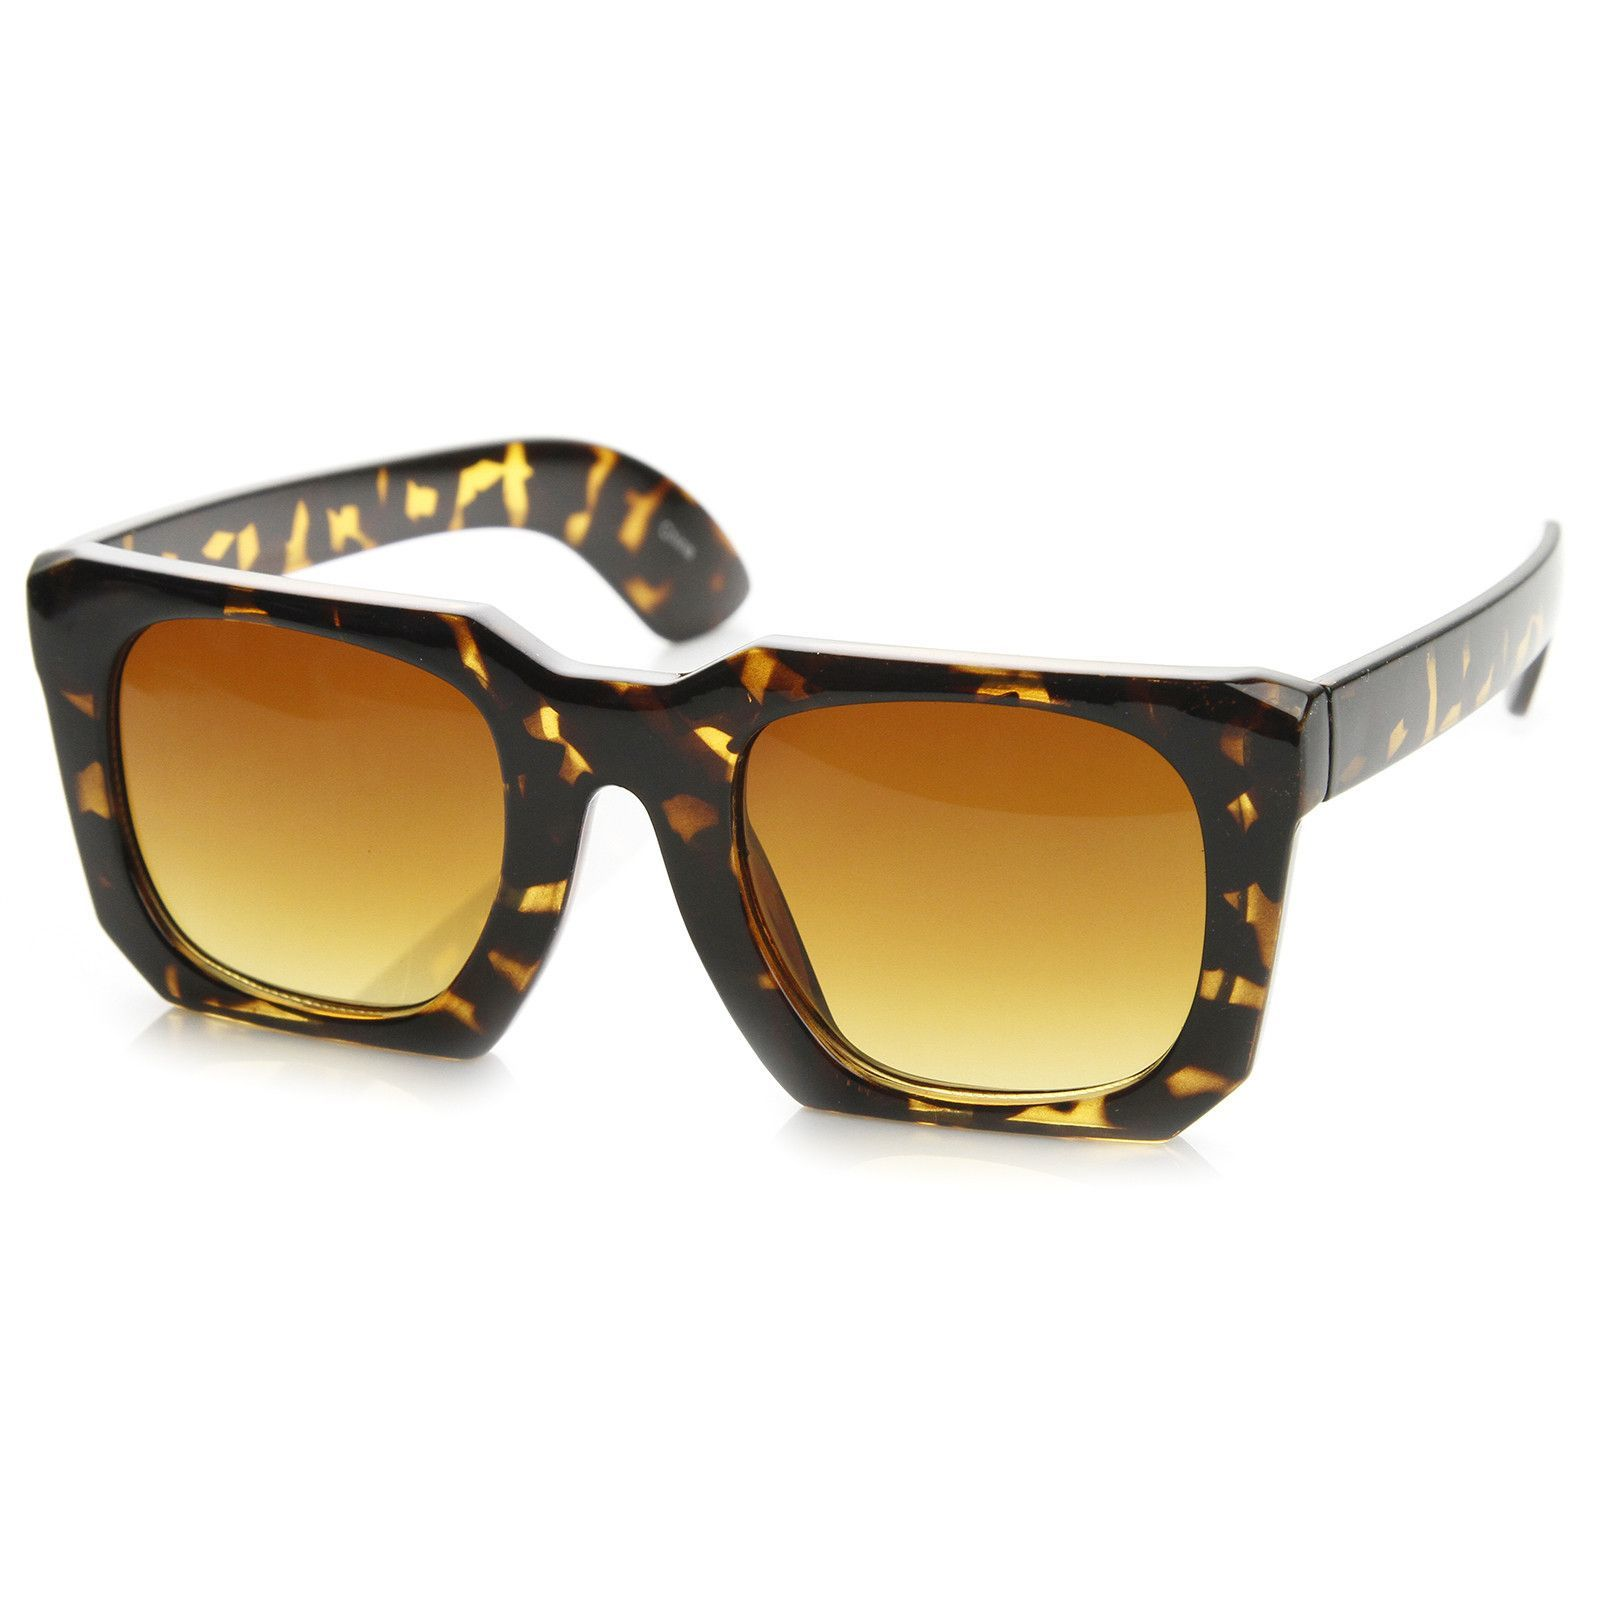 04114a3f5d9 Modular Fashion Square Womens Designer Sunglasses 8984